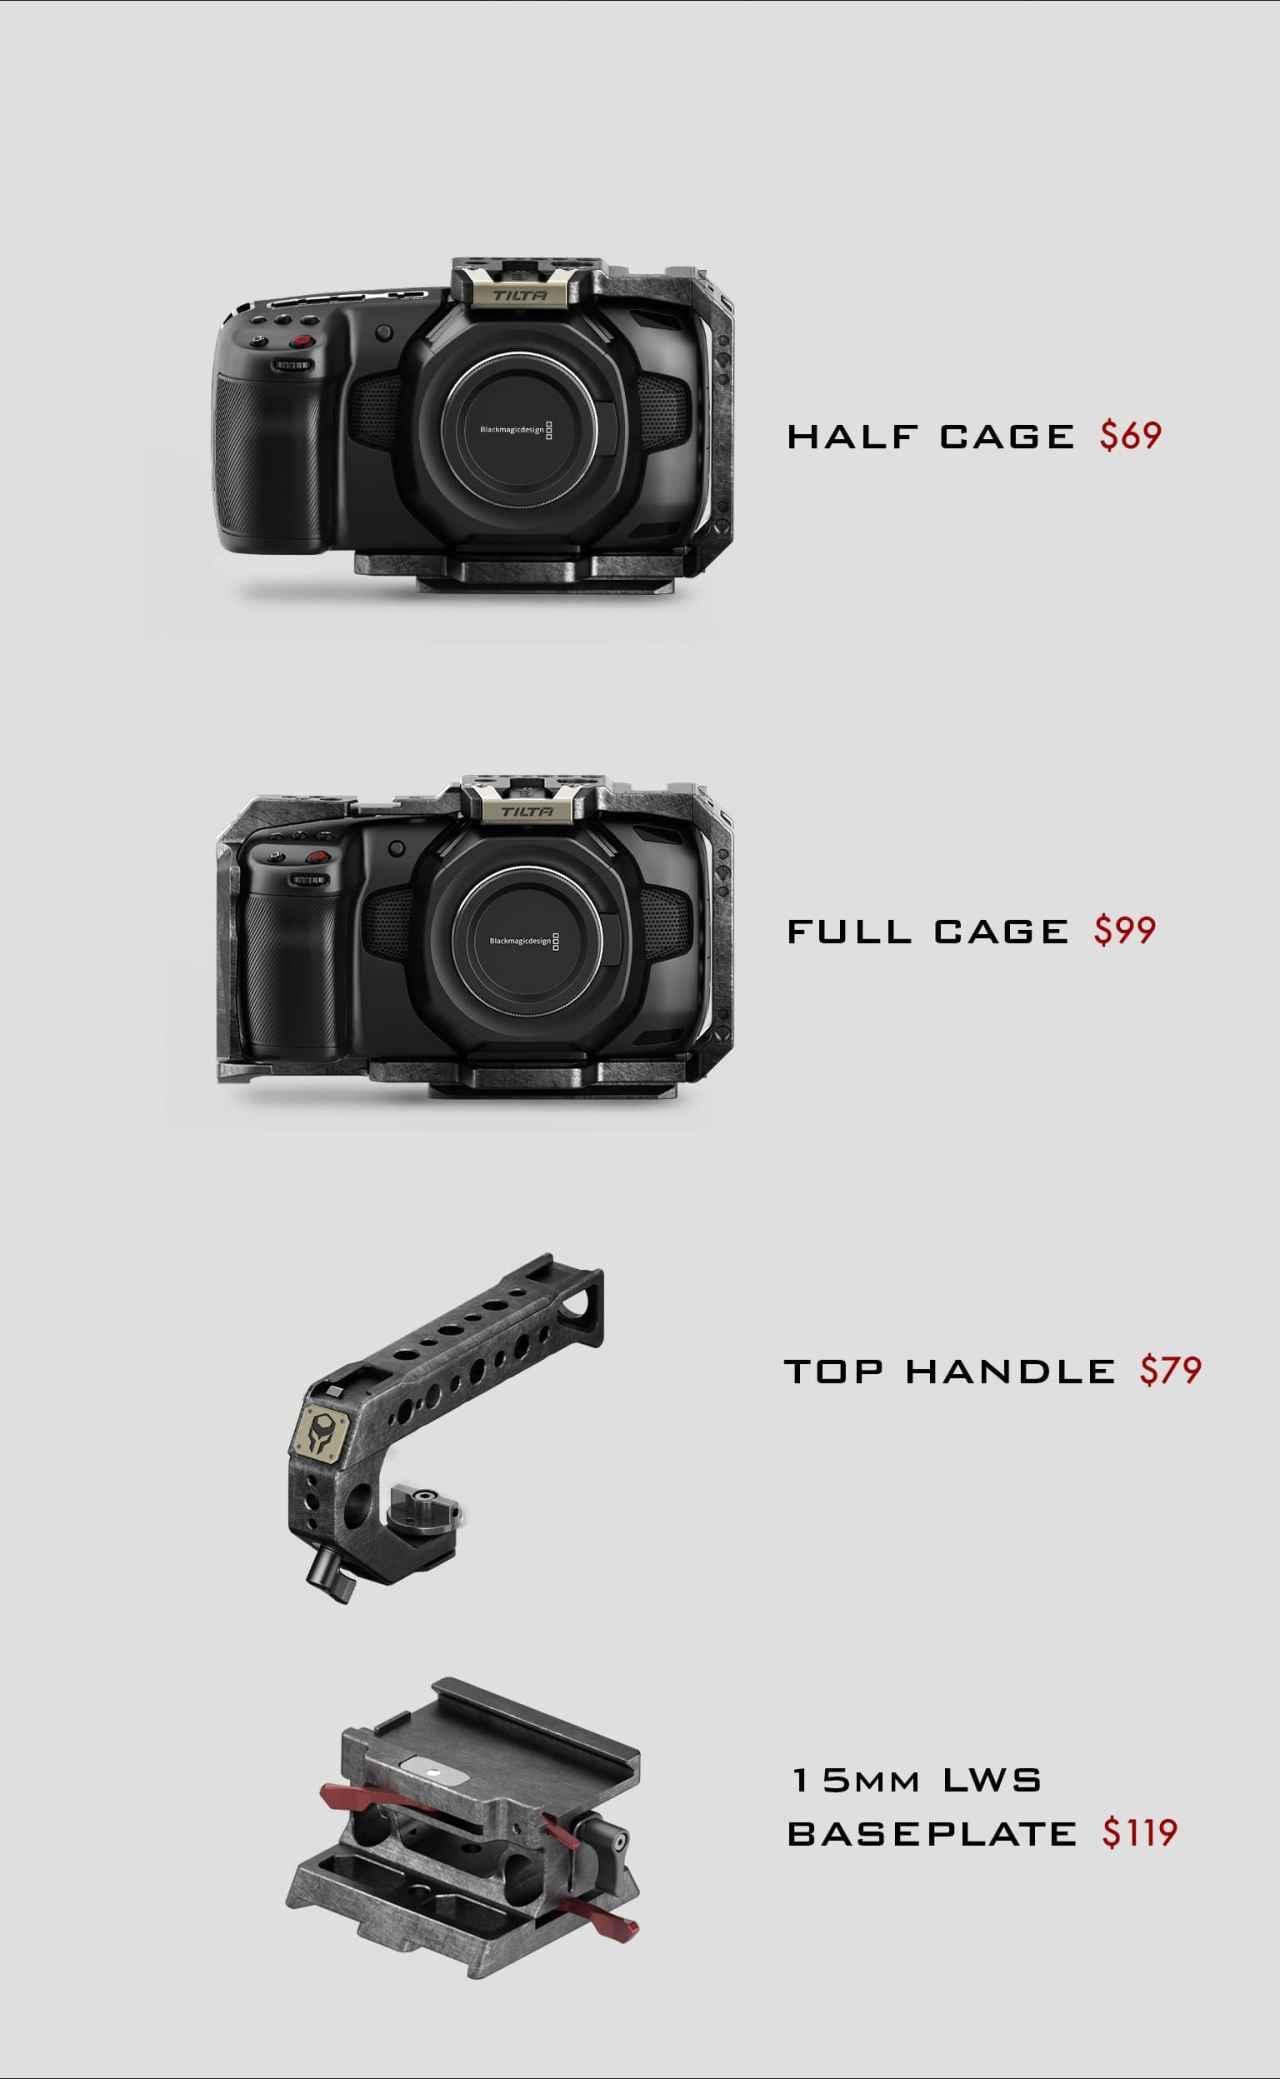 "Tilta For Blackmagic Pocket Cinema Camera 4k Wedunk À¸šà¸£ À¸© À¸— À¸"" À¸‡ À¸ˆà¸³à¸ À¸"""